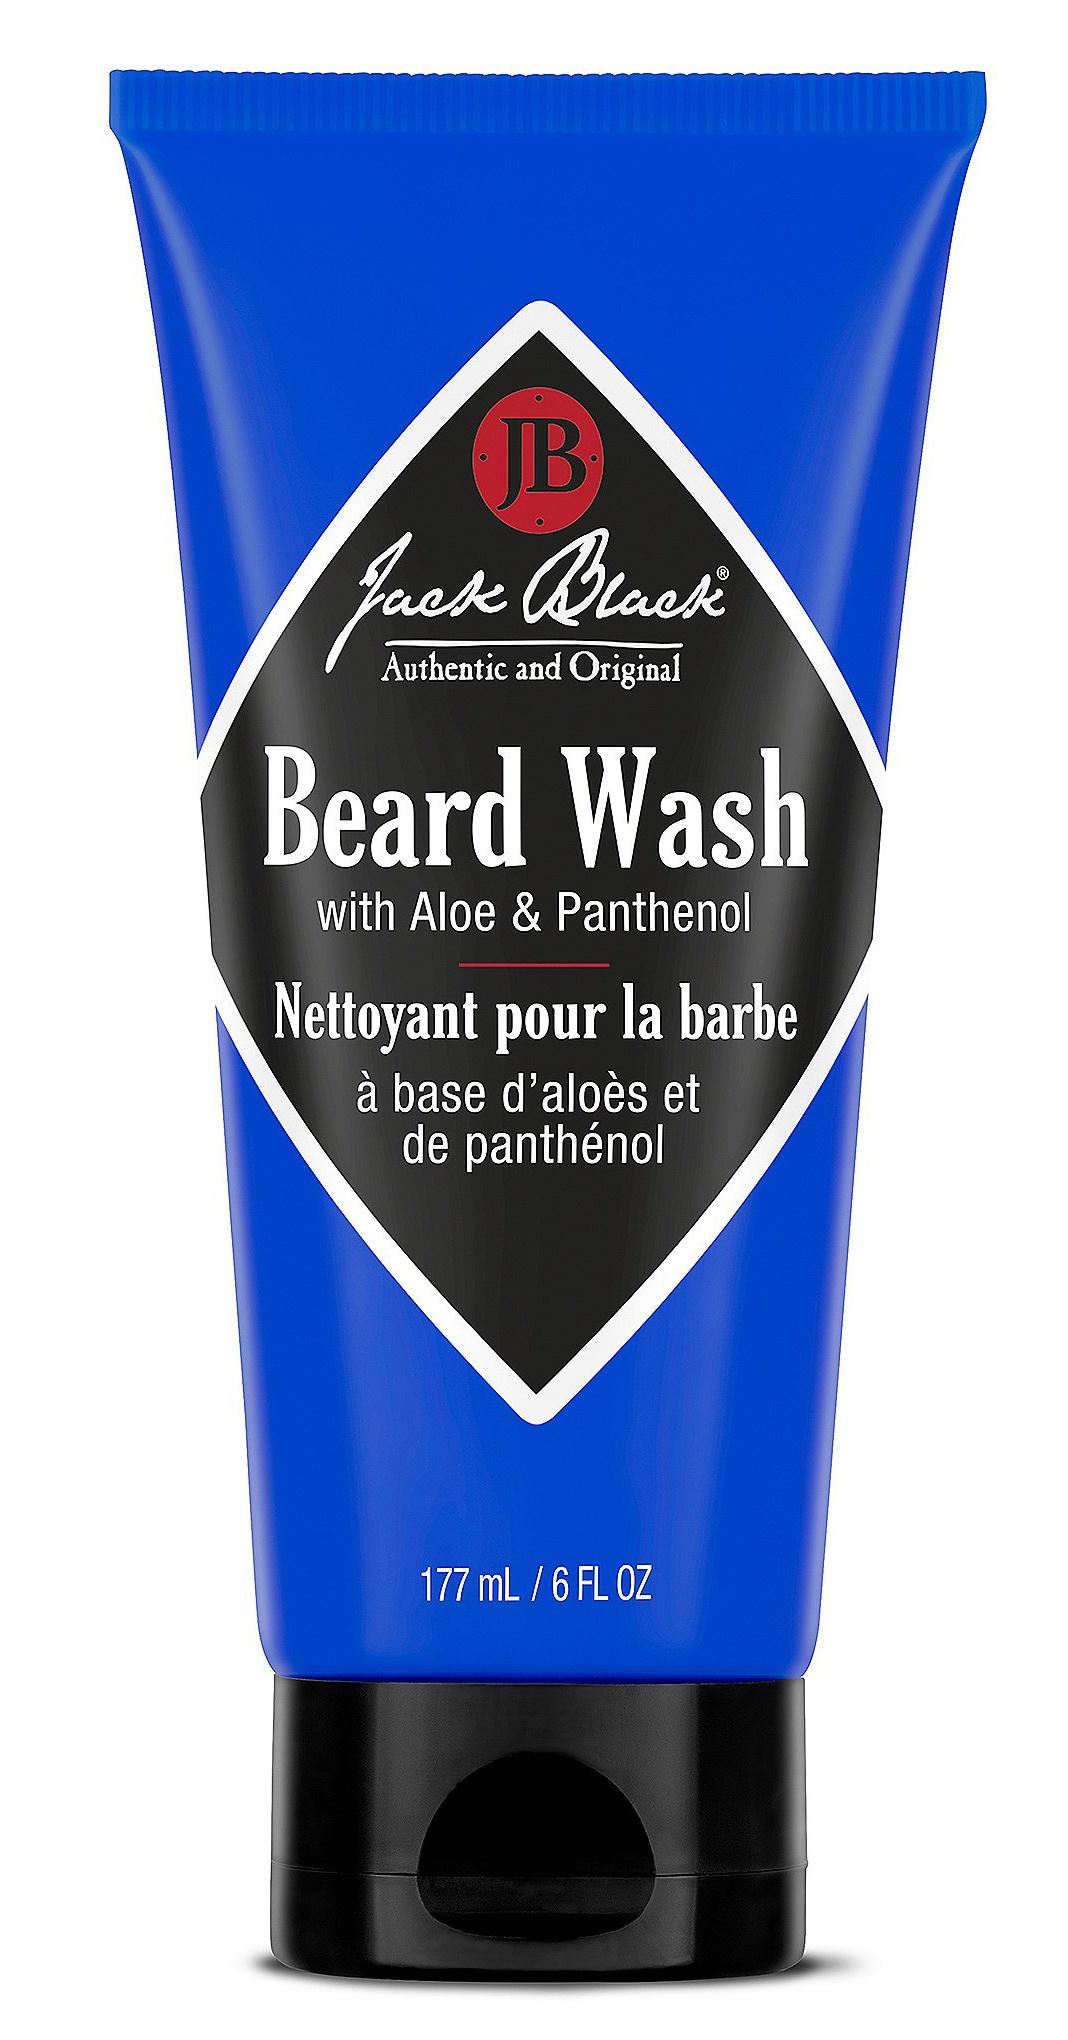 Jack Black Beard Wash with Aloe & Panthenol